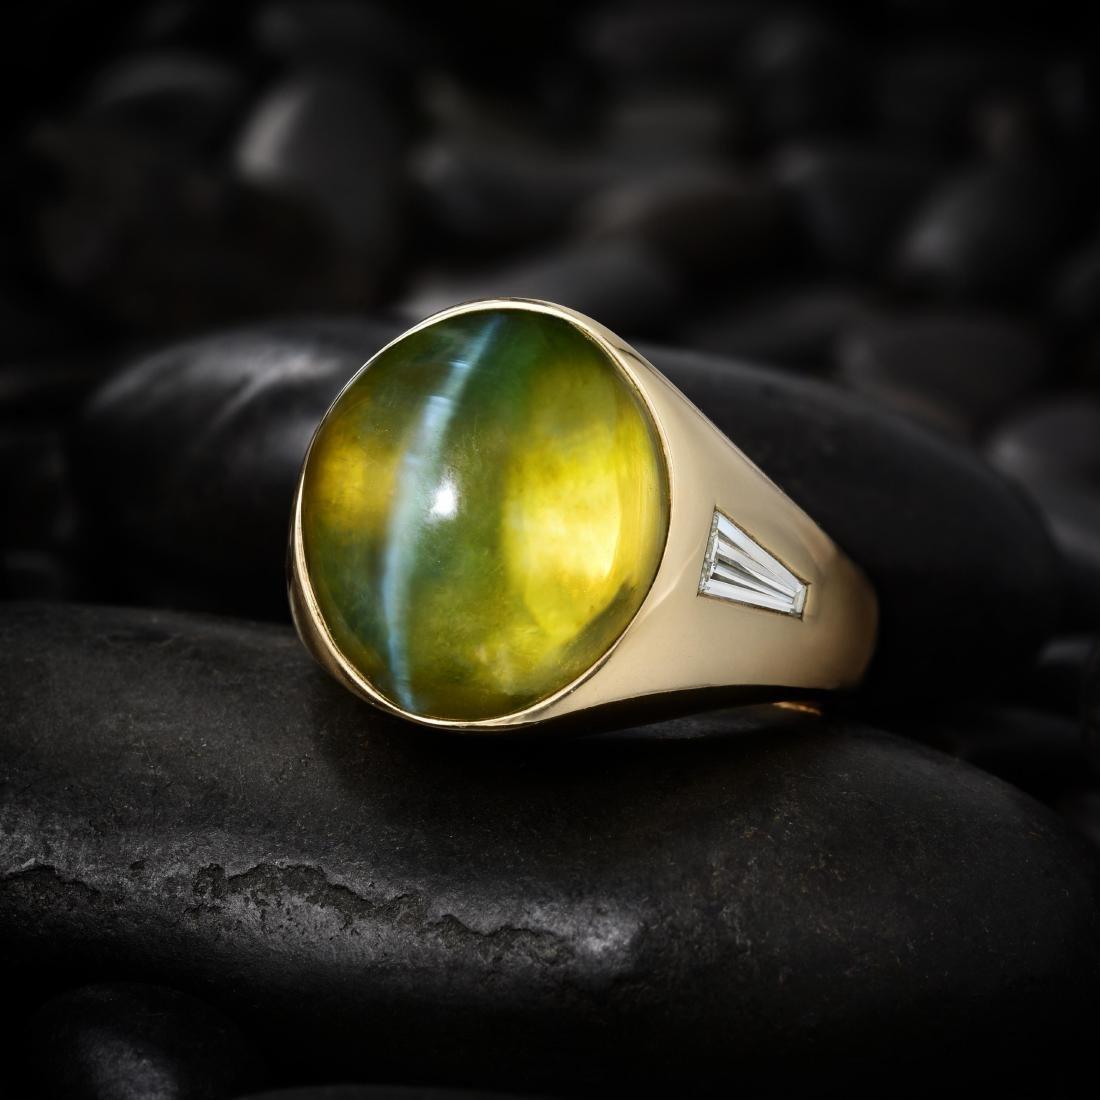 A Cat's Eye Chrysoberyl and Diamond Gentlemen's Ring